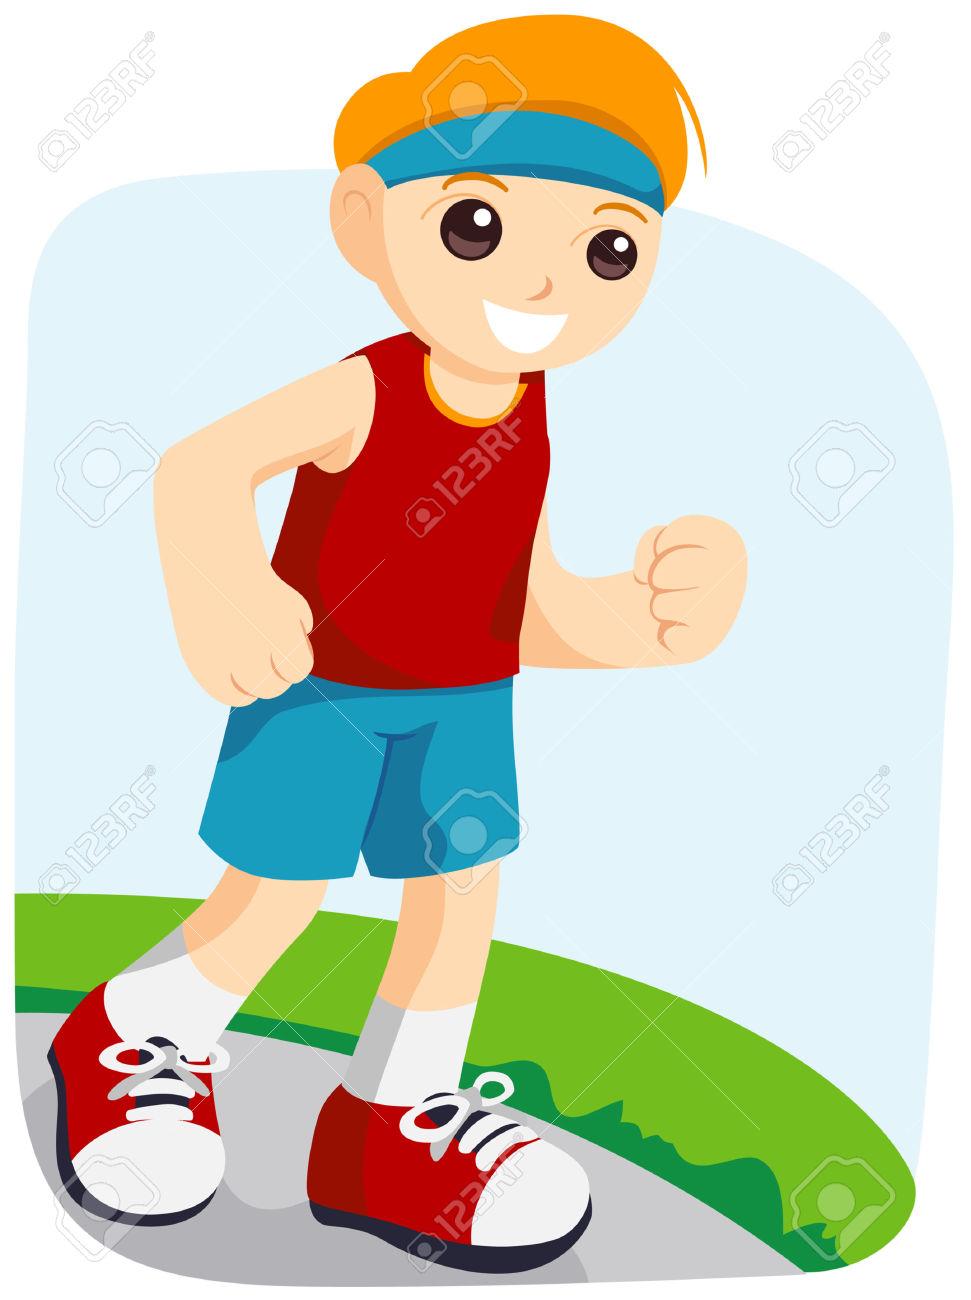 jogging clipart clipground 971 x 1300 · jpeg